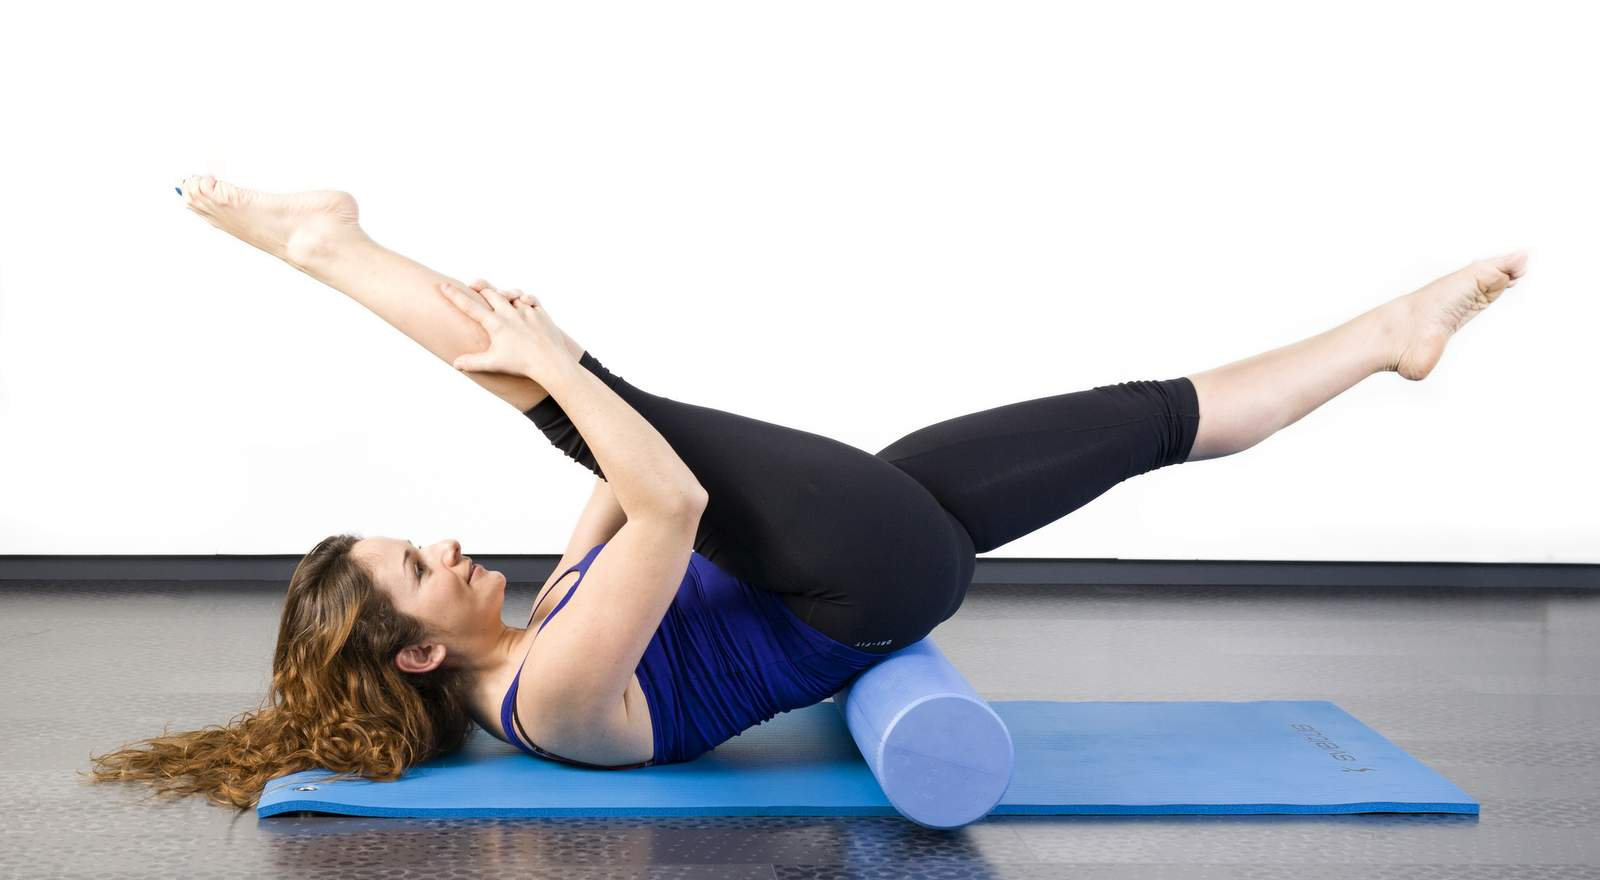 Pilates on a roller: Thurs 18:00